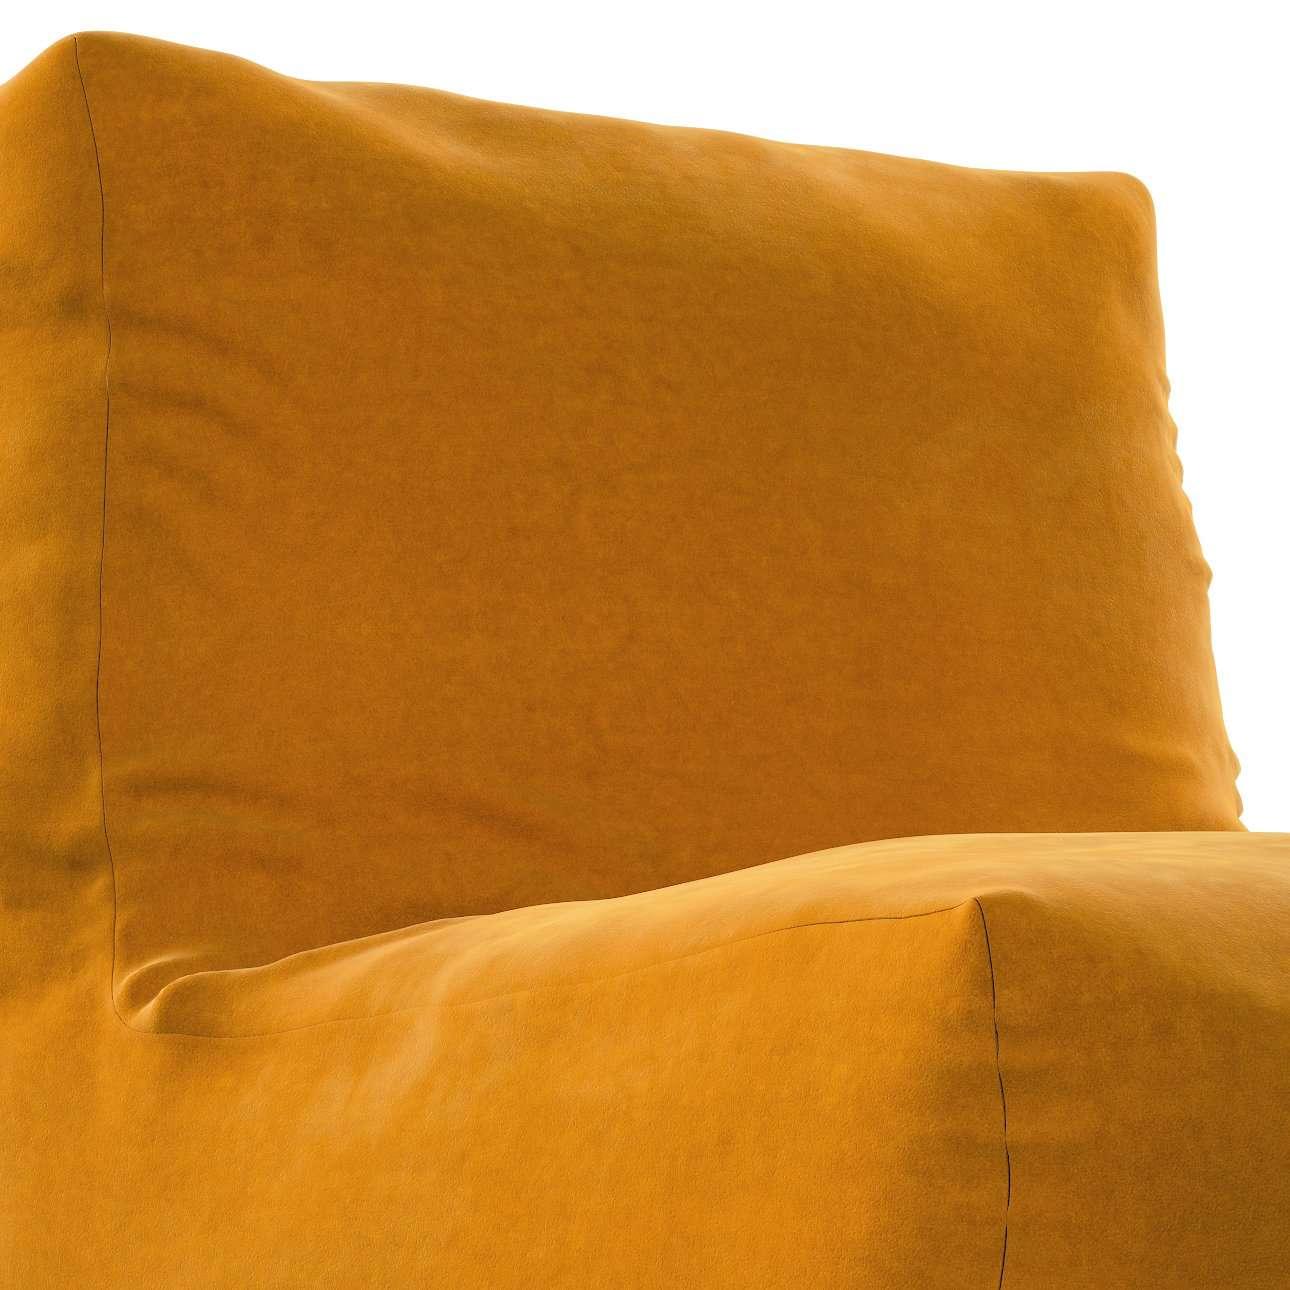 Pufa- fotel w kolekcji Velvet, tkanina: 704-23